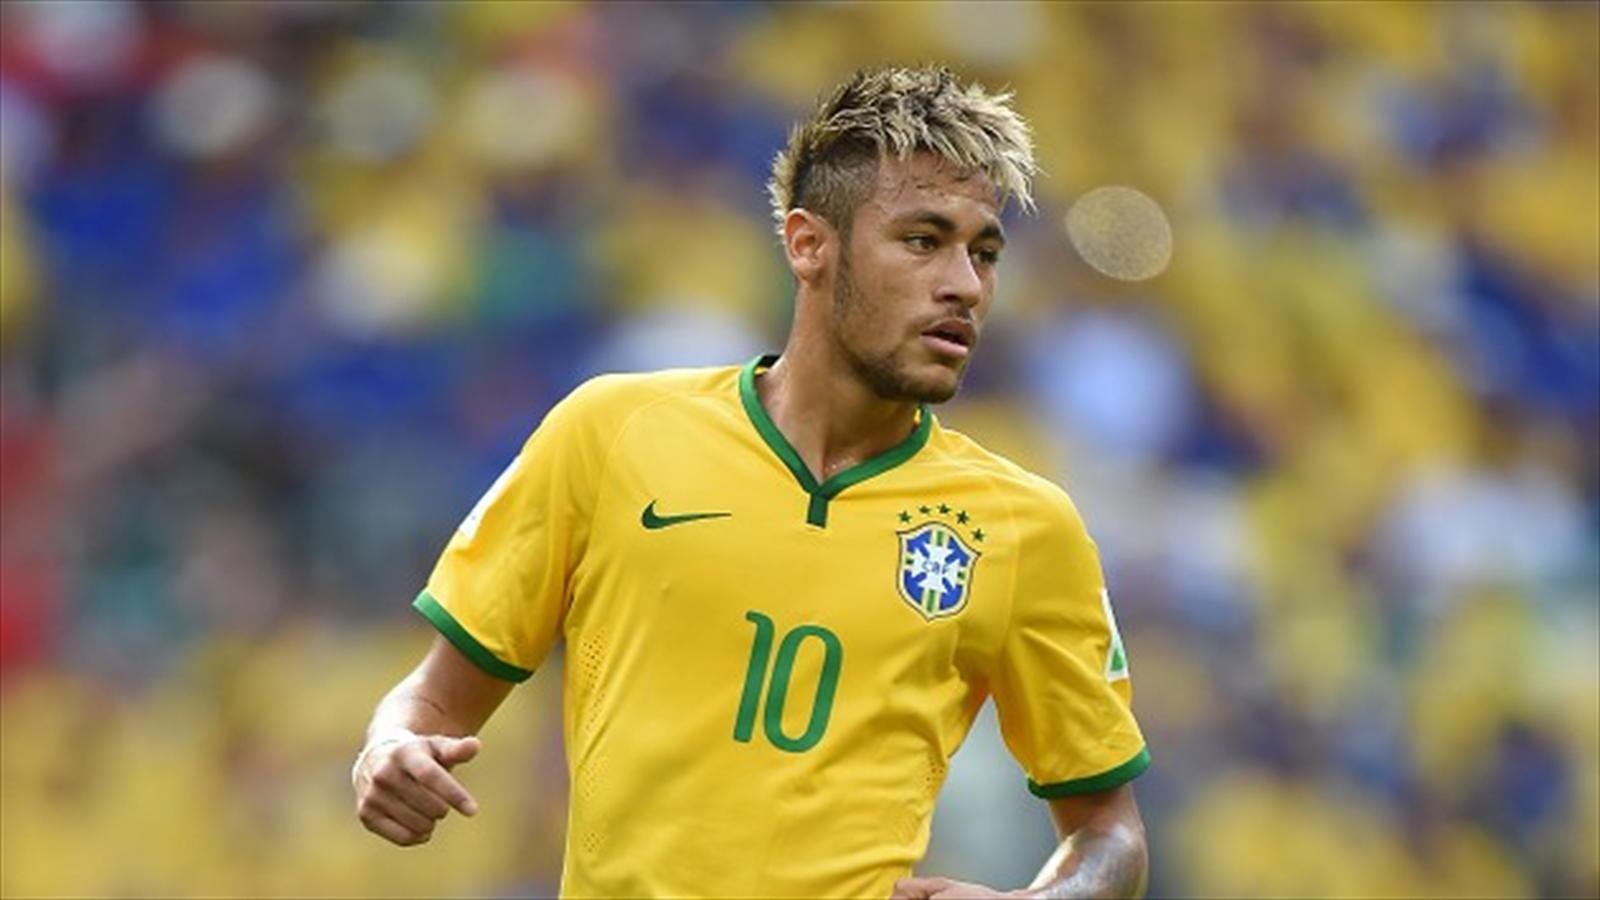 Neymar High Definition Photos Http Wallatar Com Wp Content Uploads 2015 01 Neymar High Definition Photos Jpg Http Wallat Neymar Neymar Brazil Neymar Jr